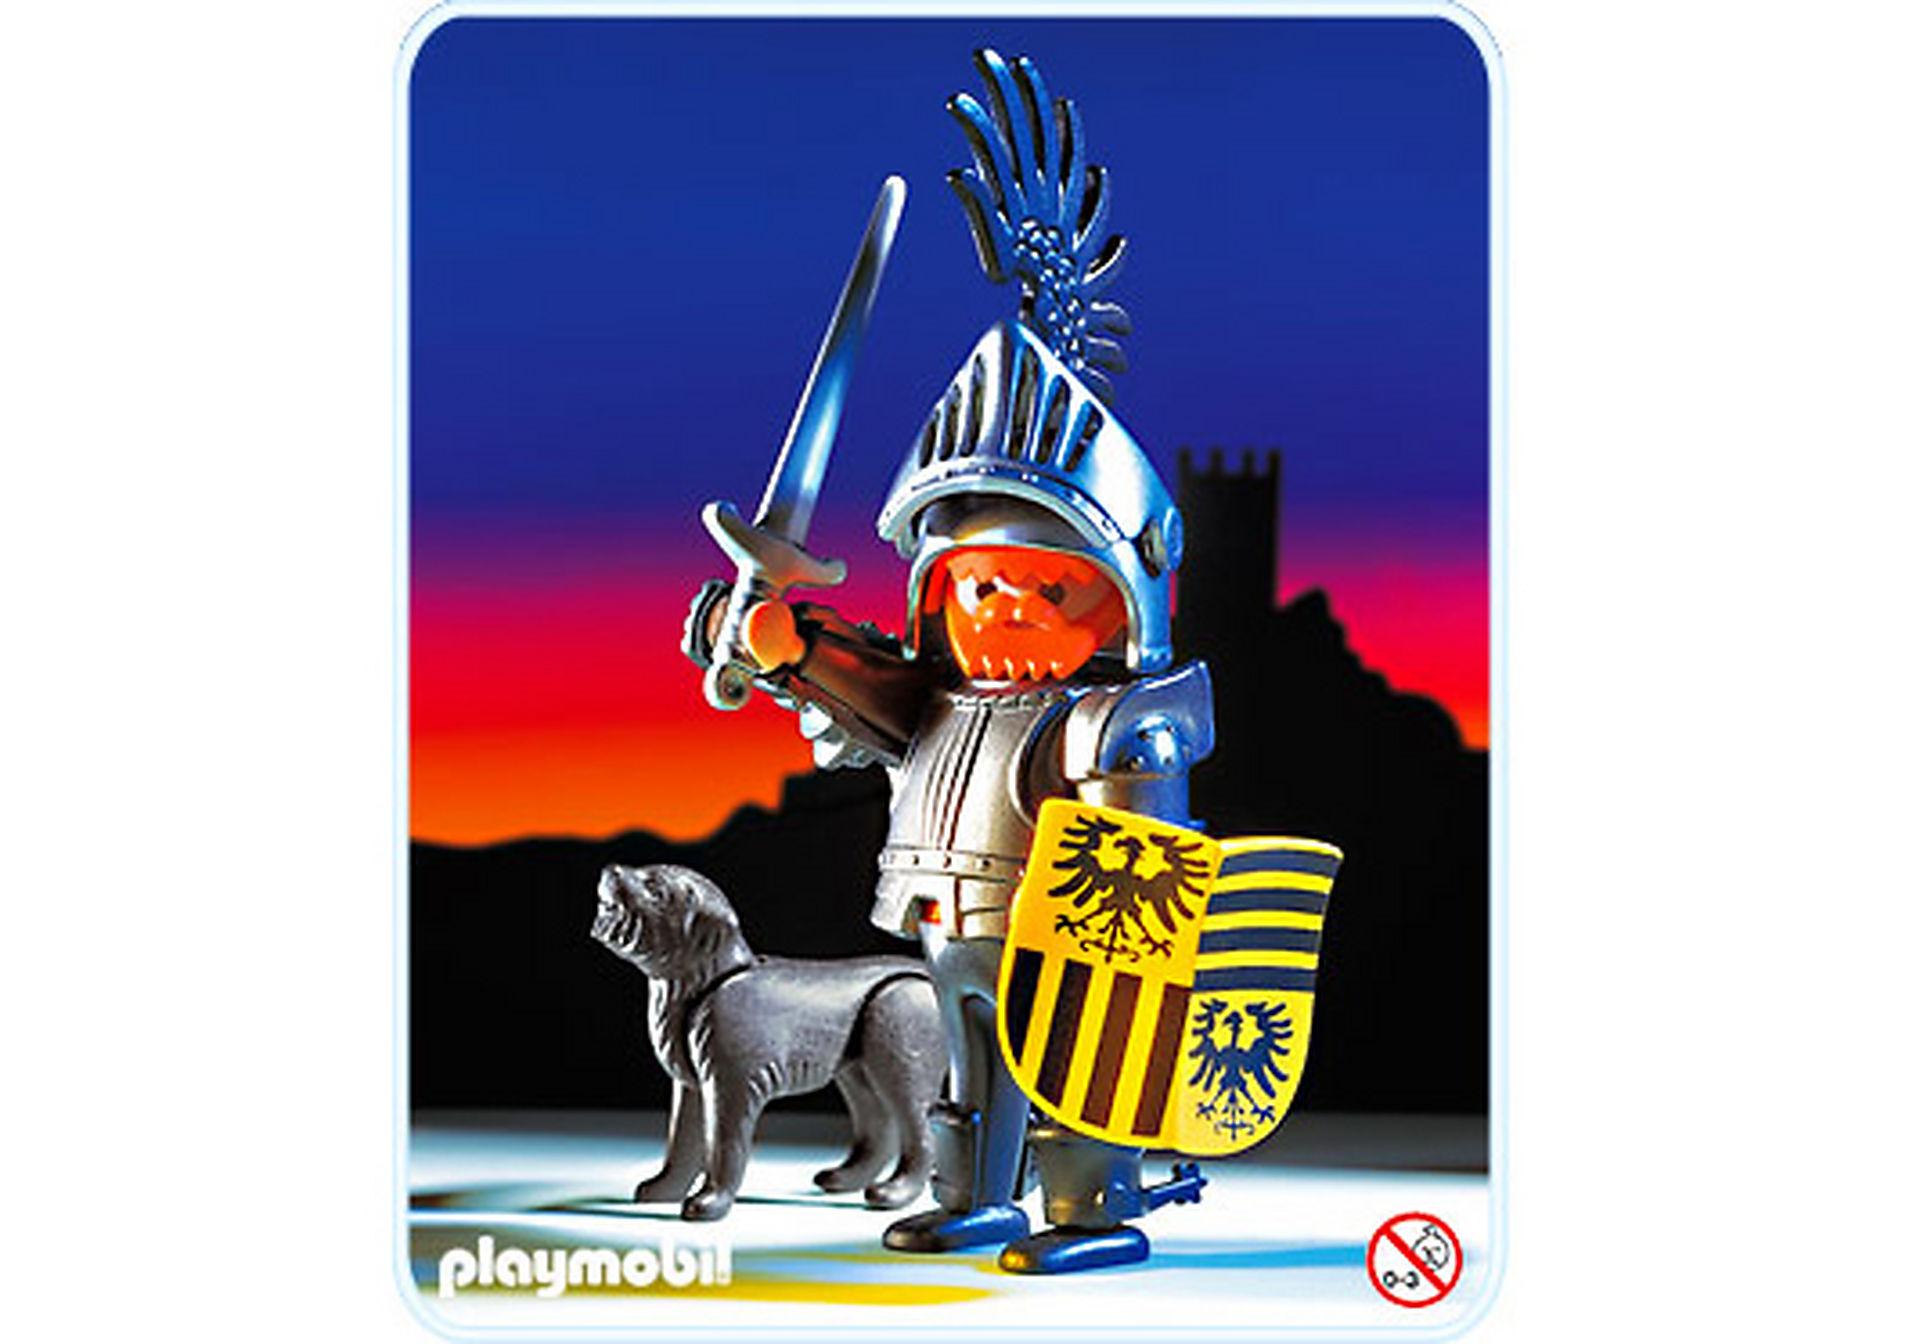 http://media.playmobil.com/i/playmobil/3890-A_product_detail/Chevalier / armure